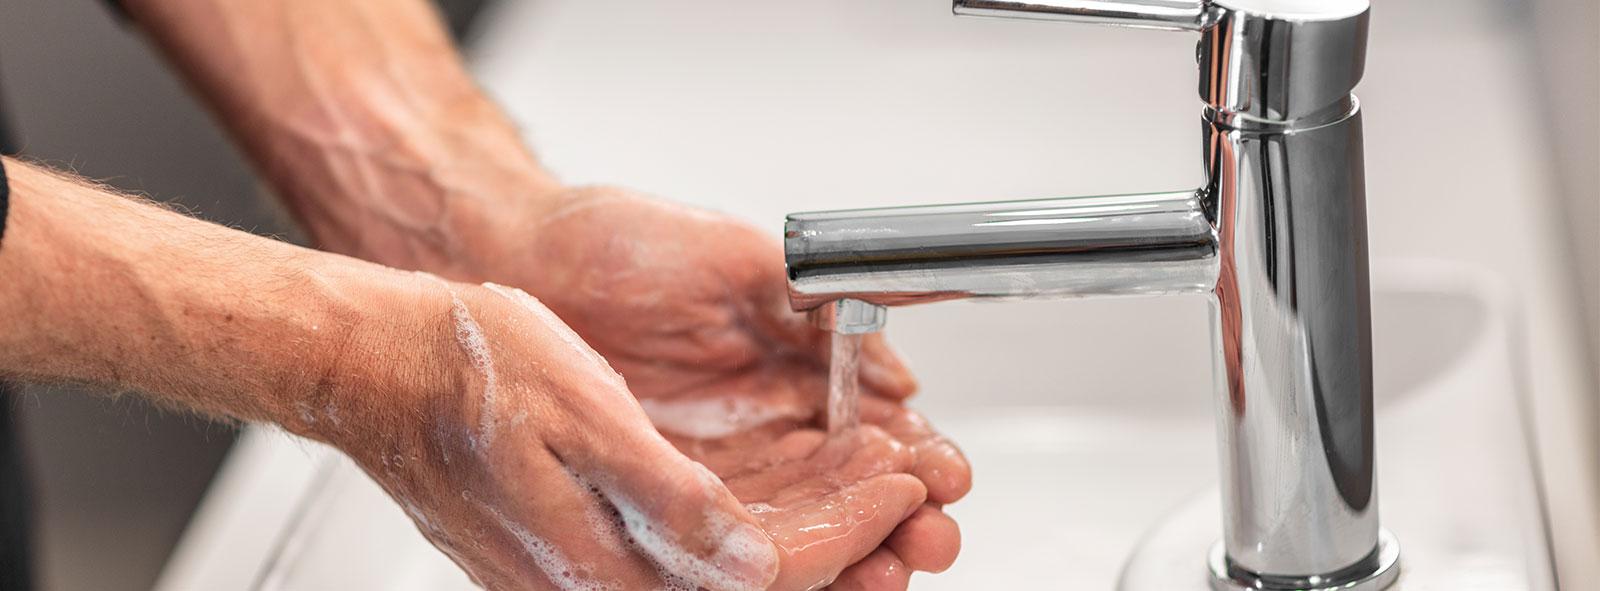 Washing hands man rinsing soap with running water at sink, Coronavirus prevention hand hygiene.